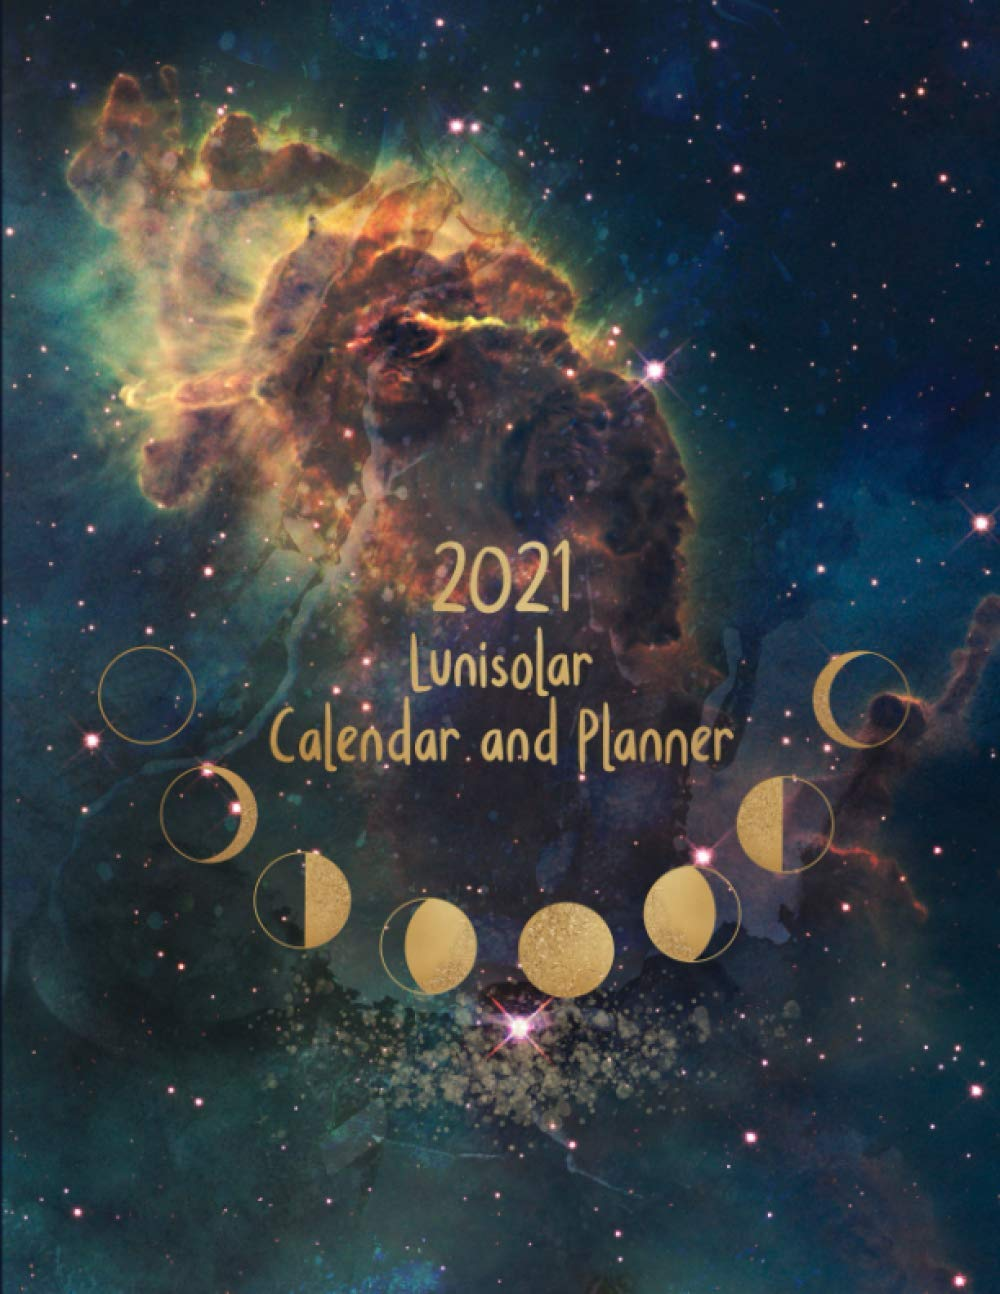 2021 Lunisolar Calendar and Planner: With Lunar Phases Calendar